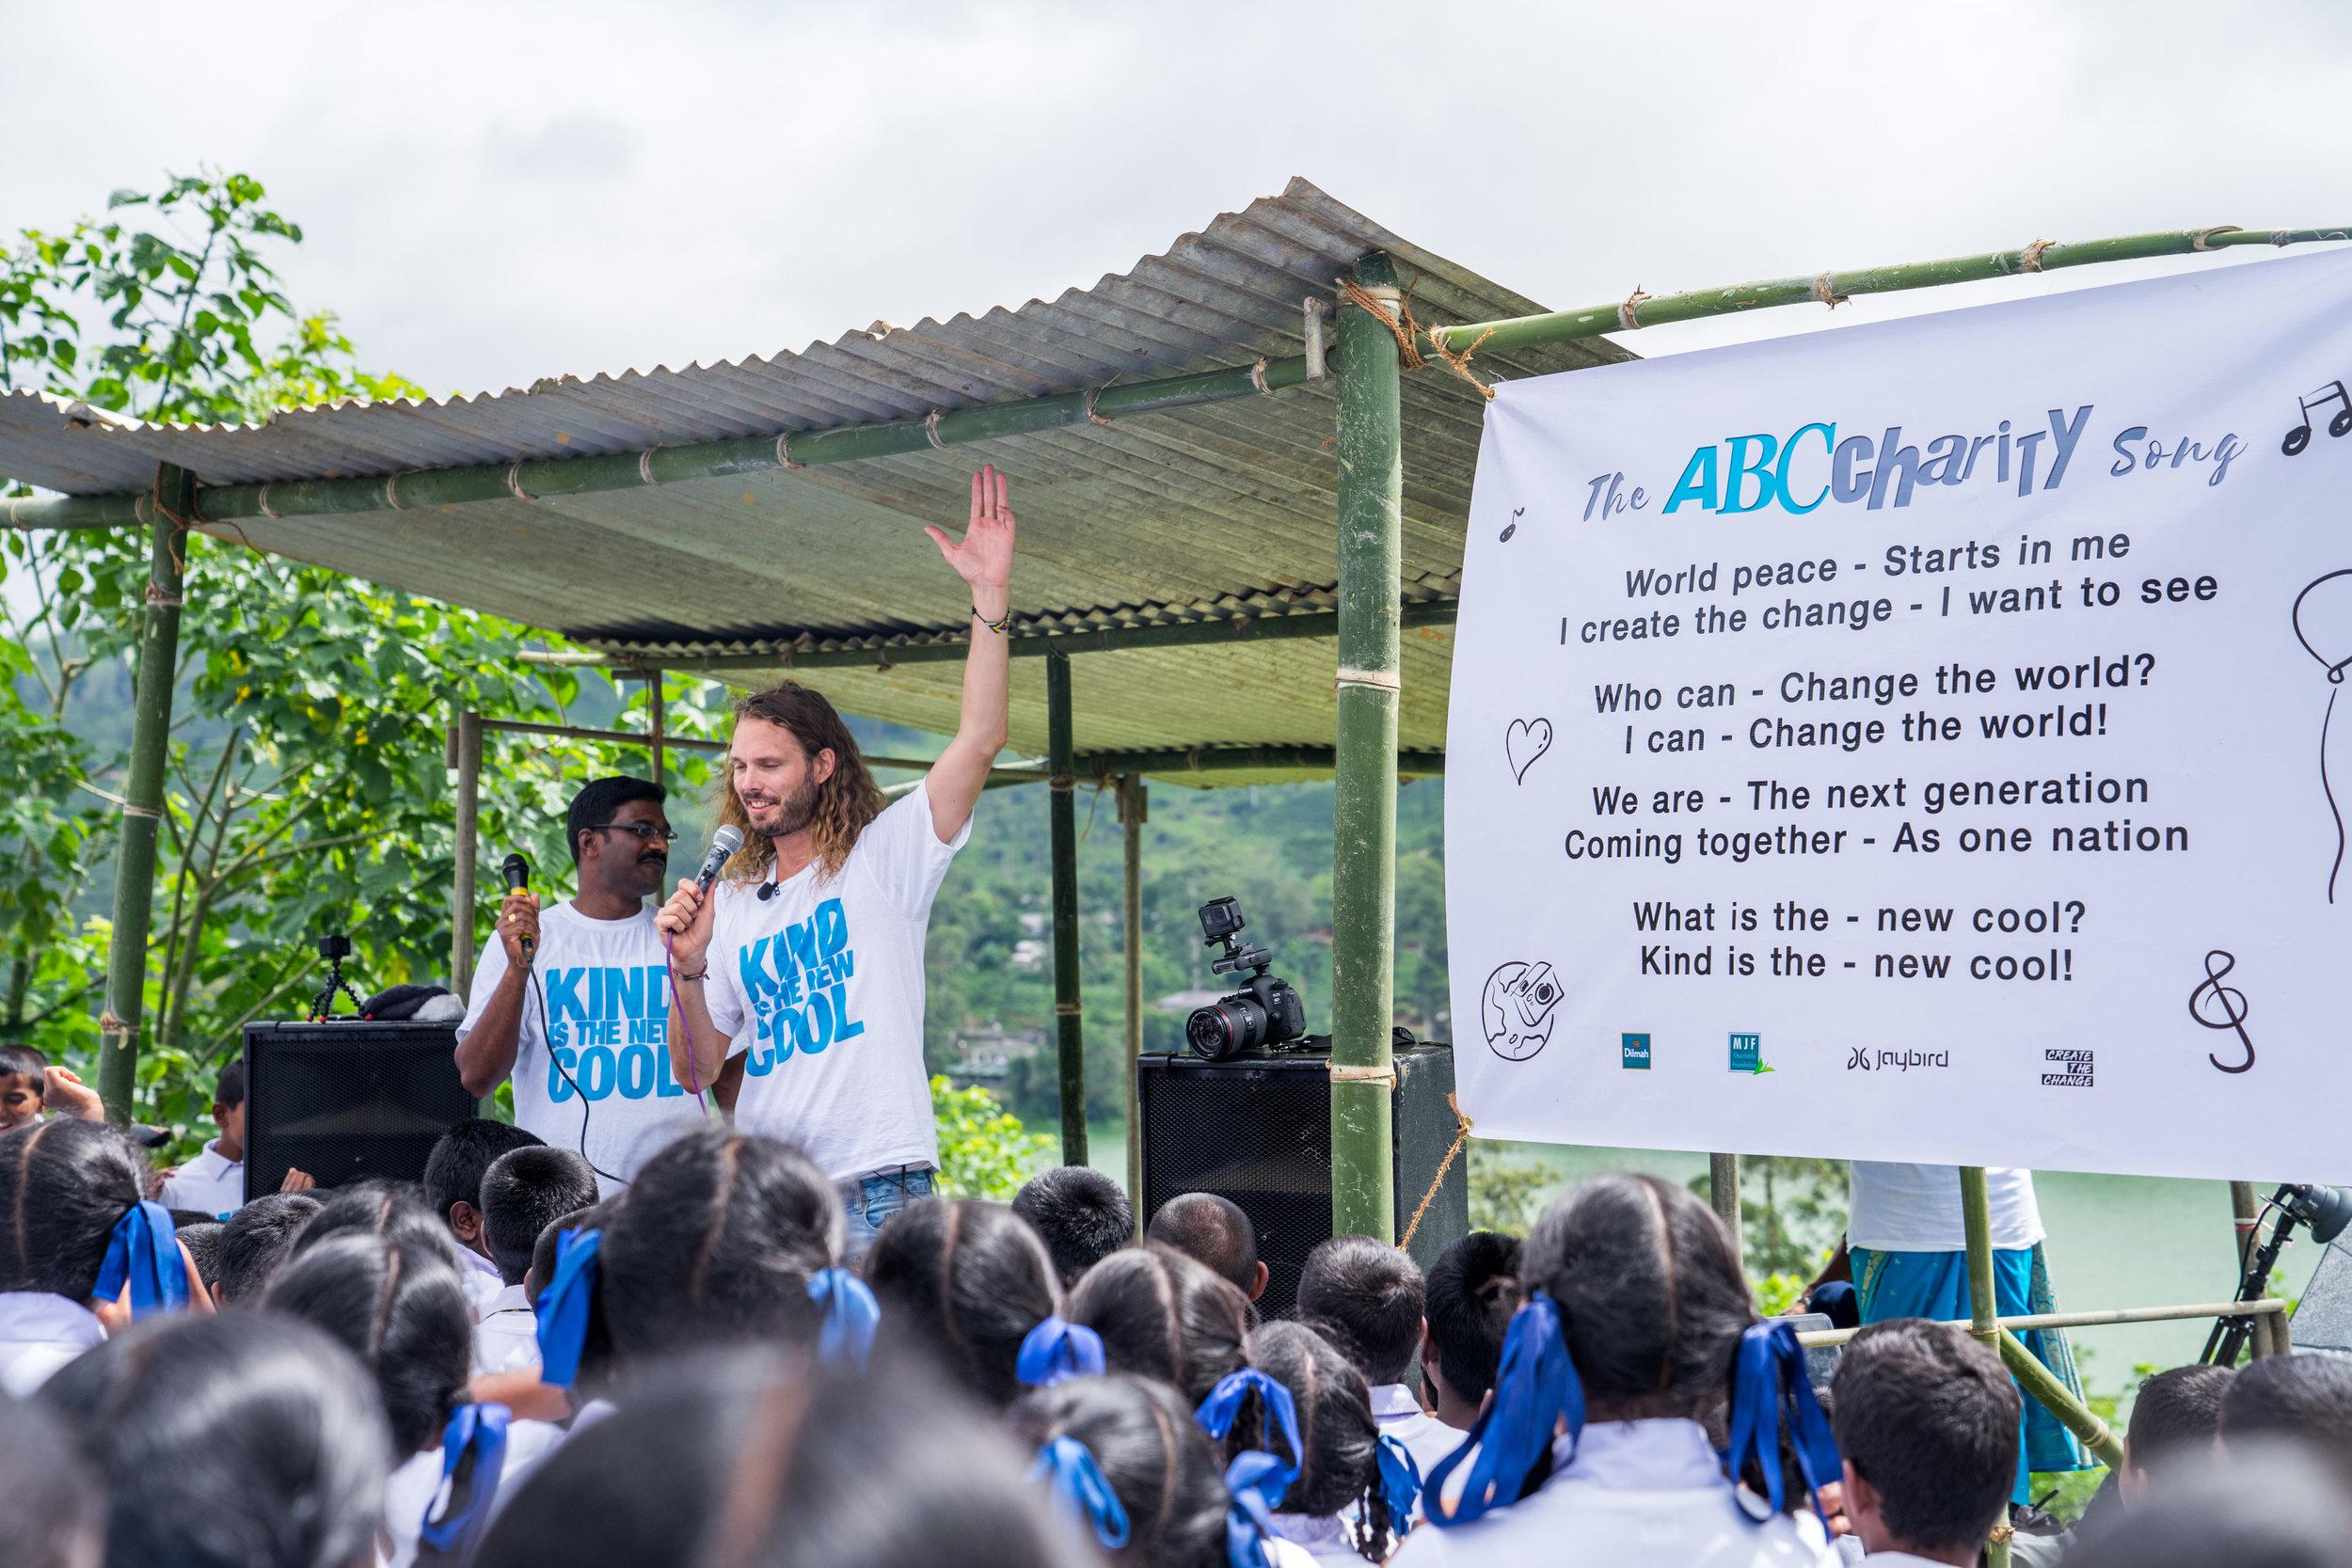 ABC-charity-fgaDSC01904.jpg